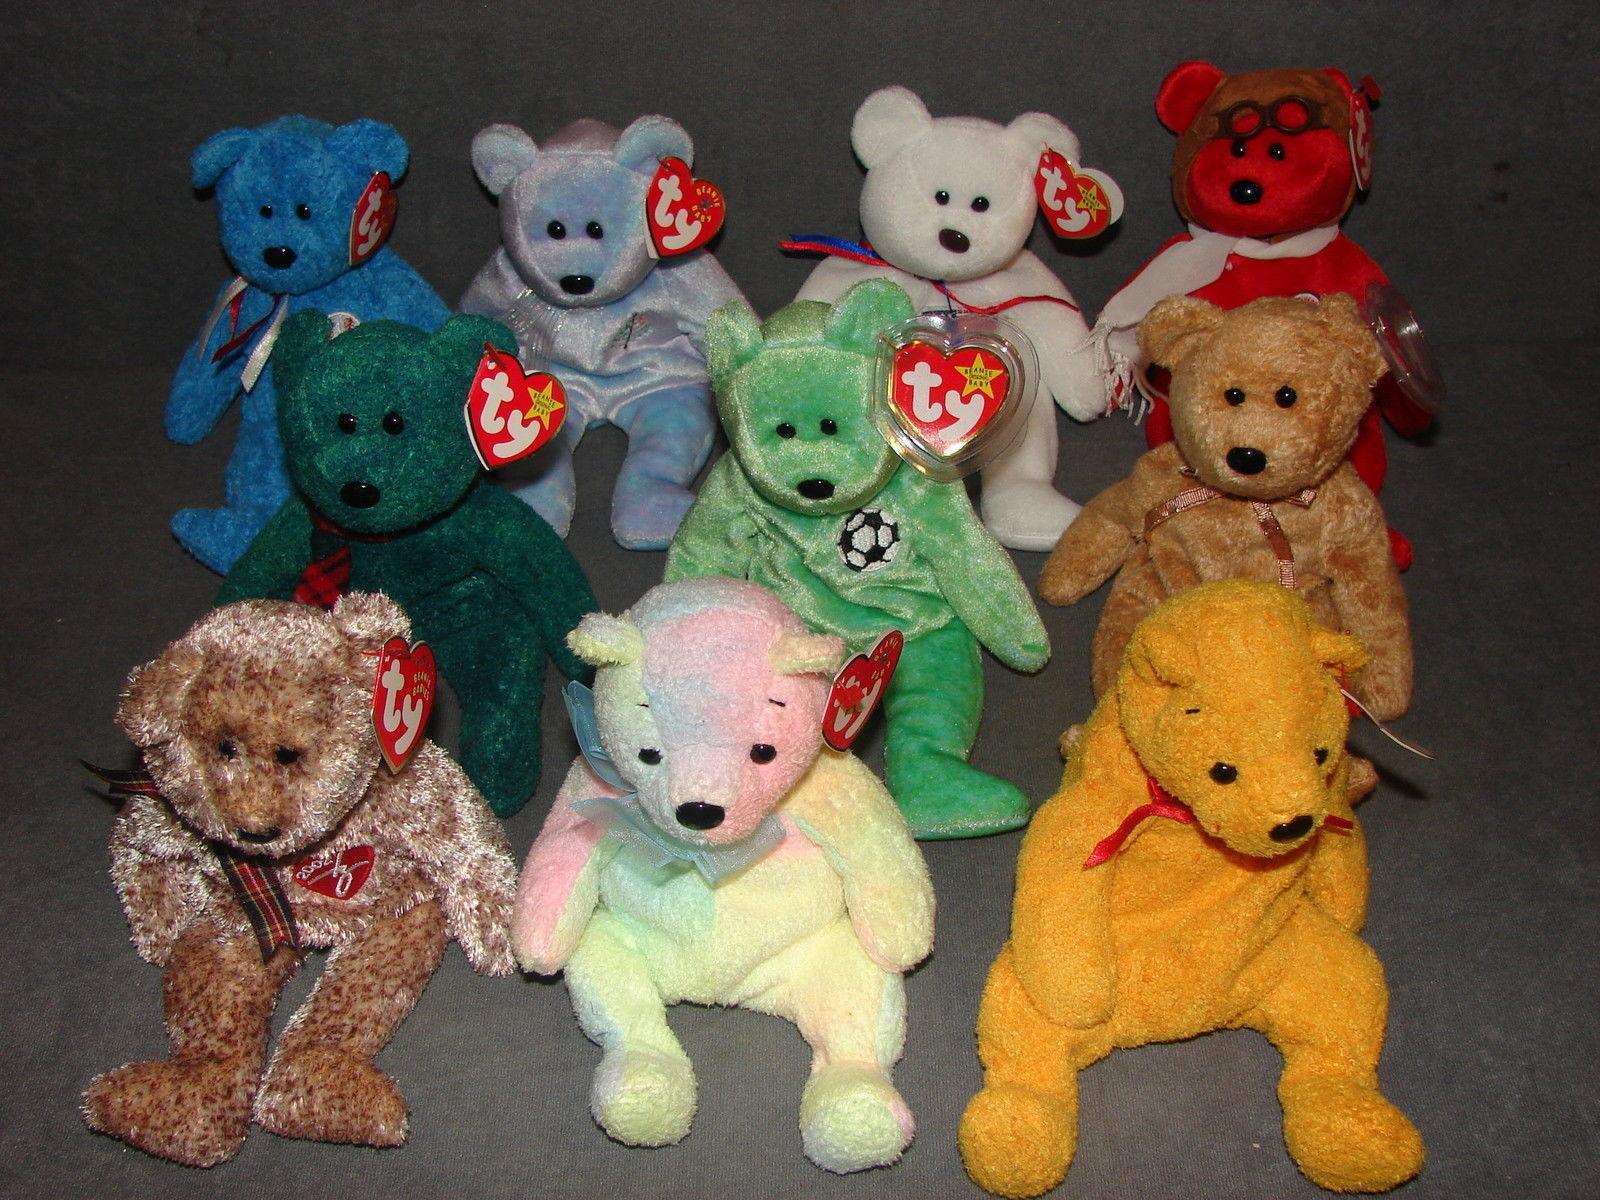 ab9a2883157 Ty Beanie Babies  10 Bears Bearon Cashew Issy Kicks Mellow Poopsie Wallace  NWT